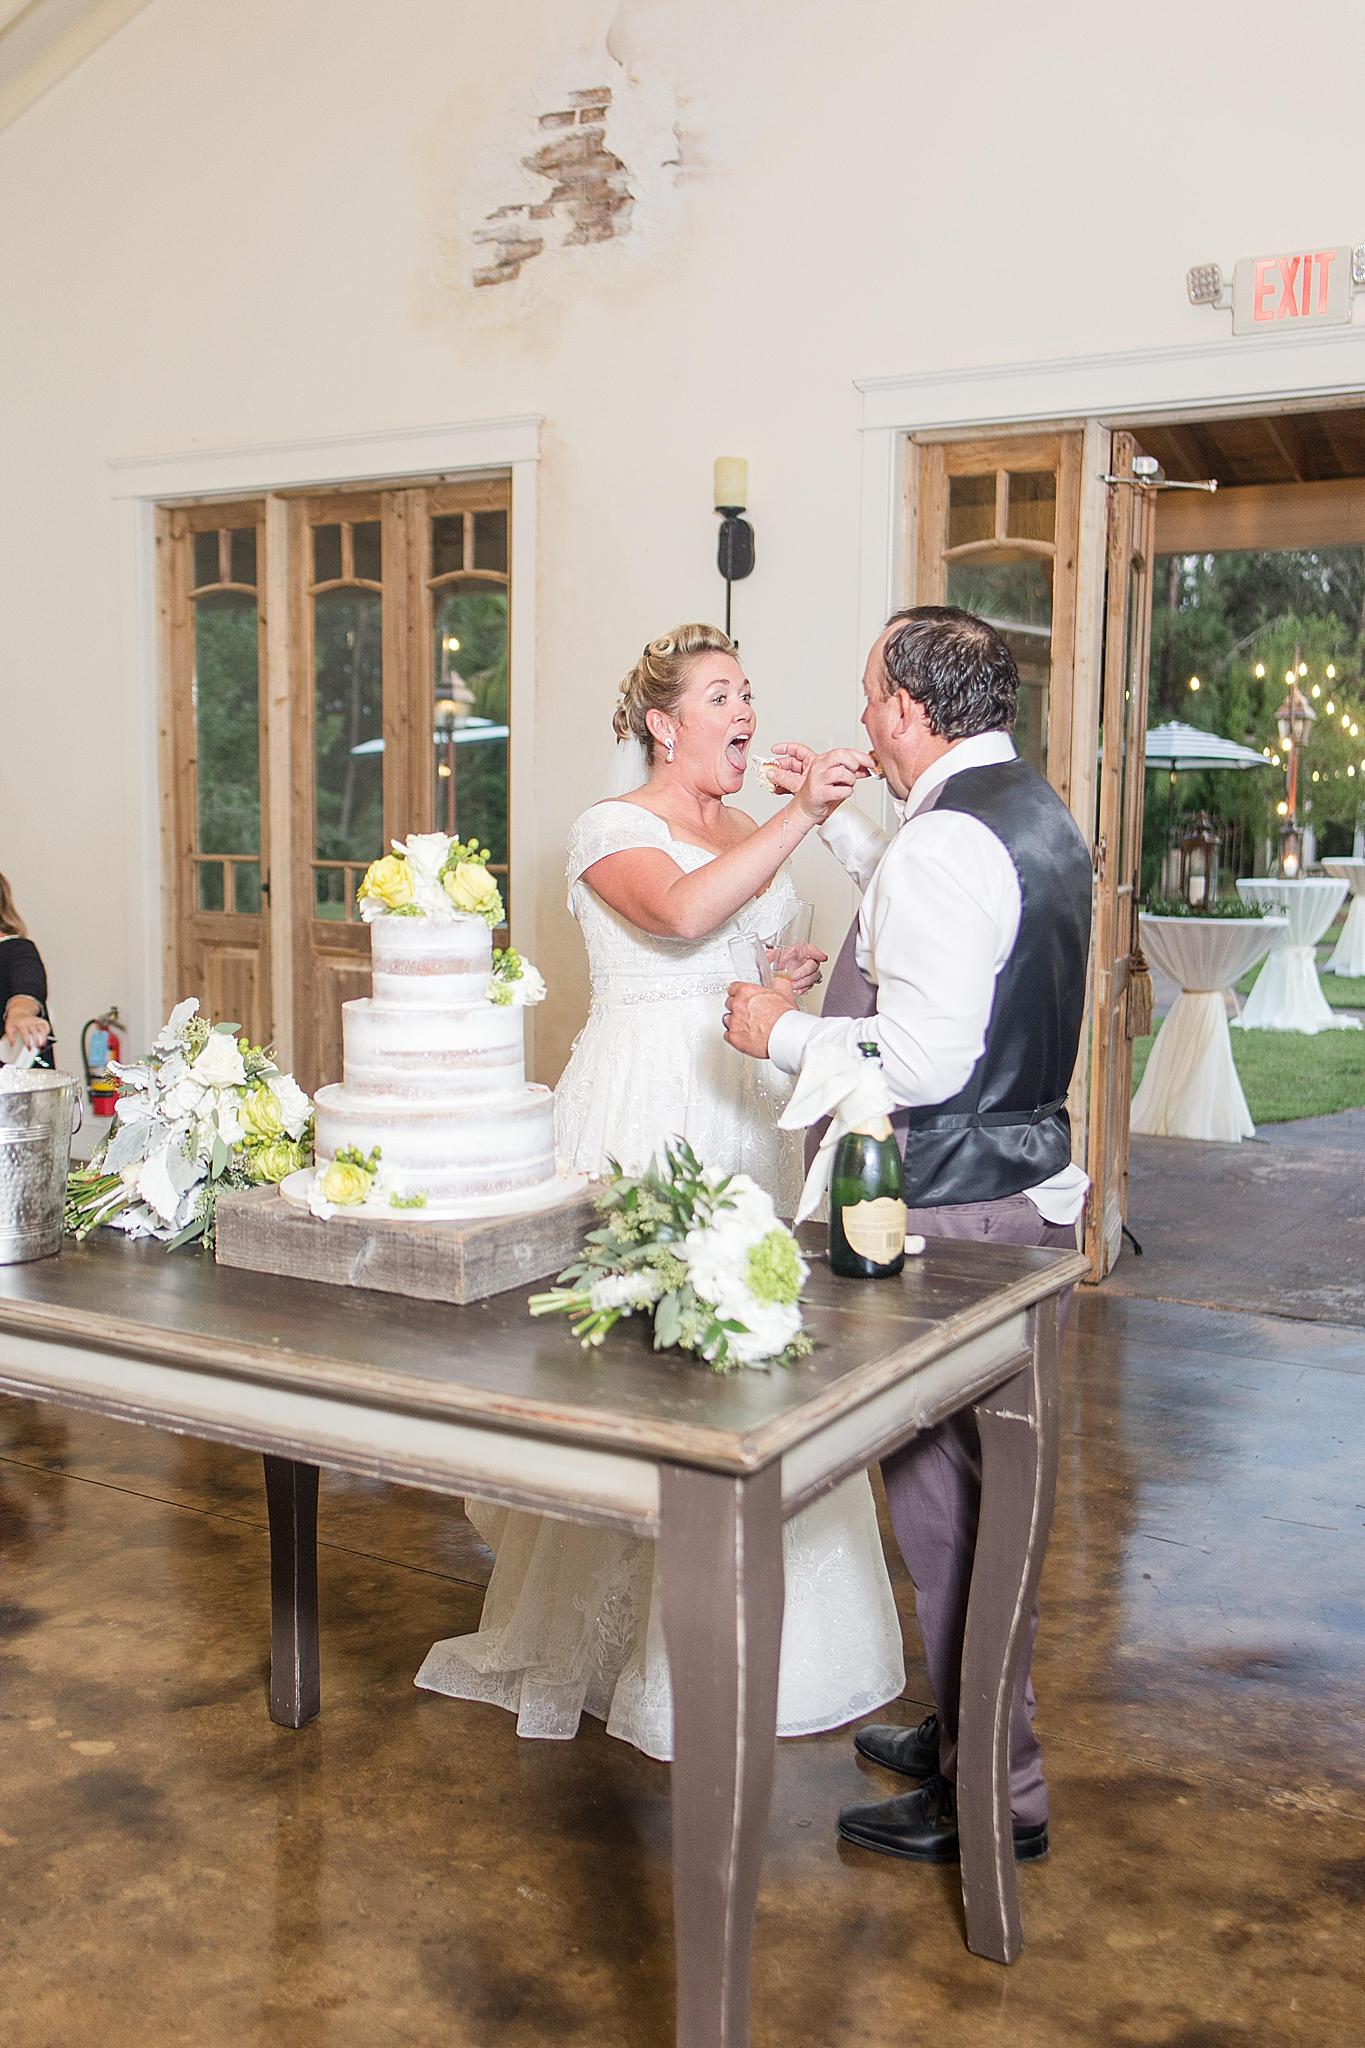 cake cutting during Alabama wedding reception